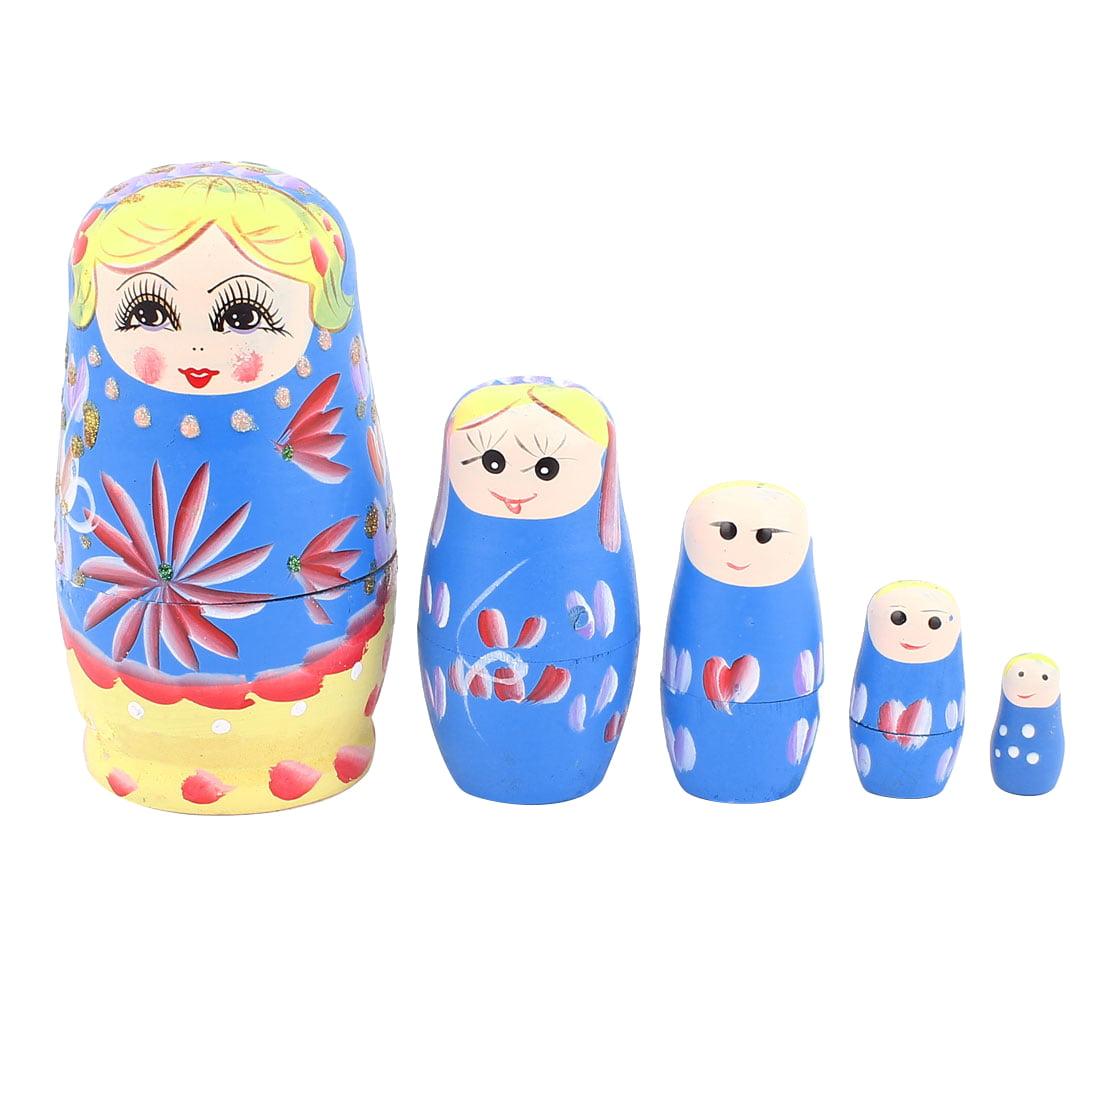 Unique Bargains Russian Babushka Flowers Painted Nesting Matryoshka Doll Deep Blue 5 in 1